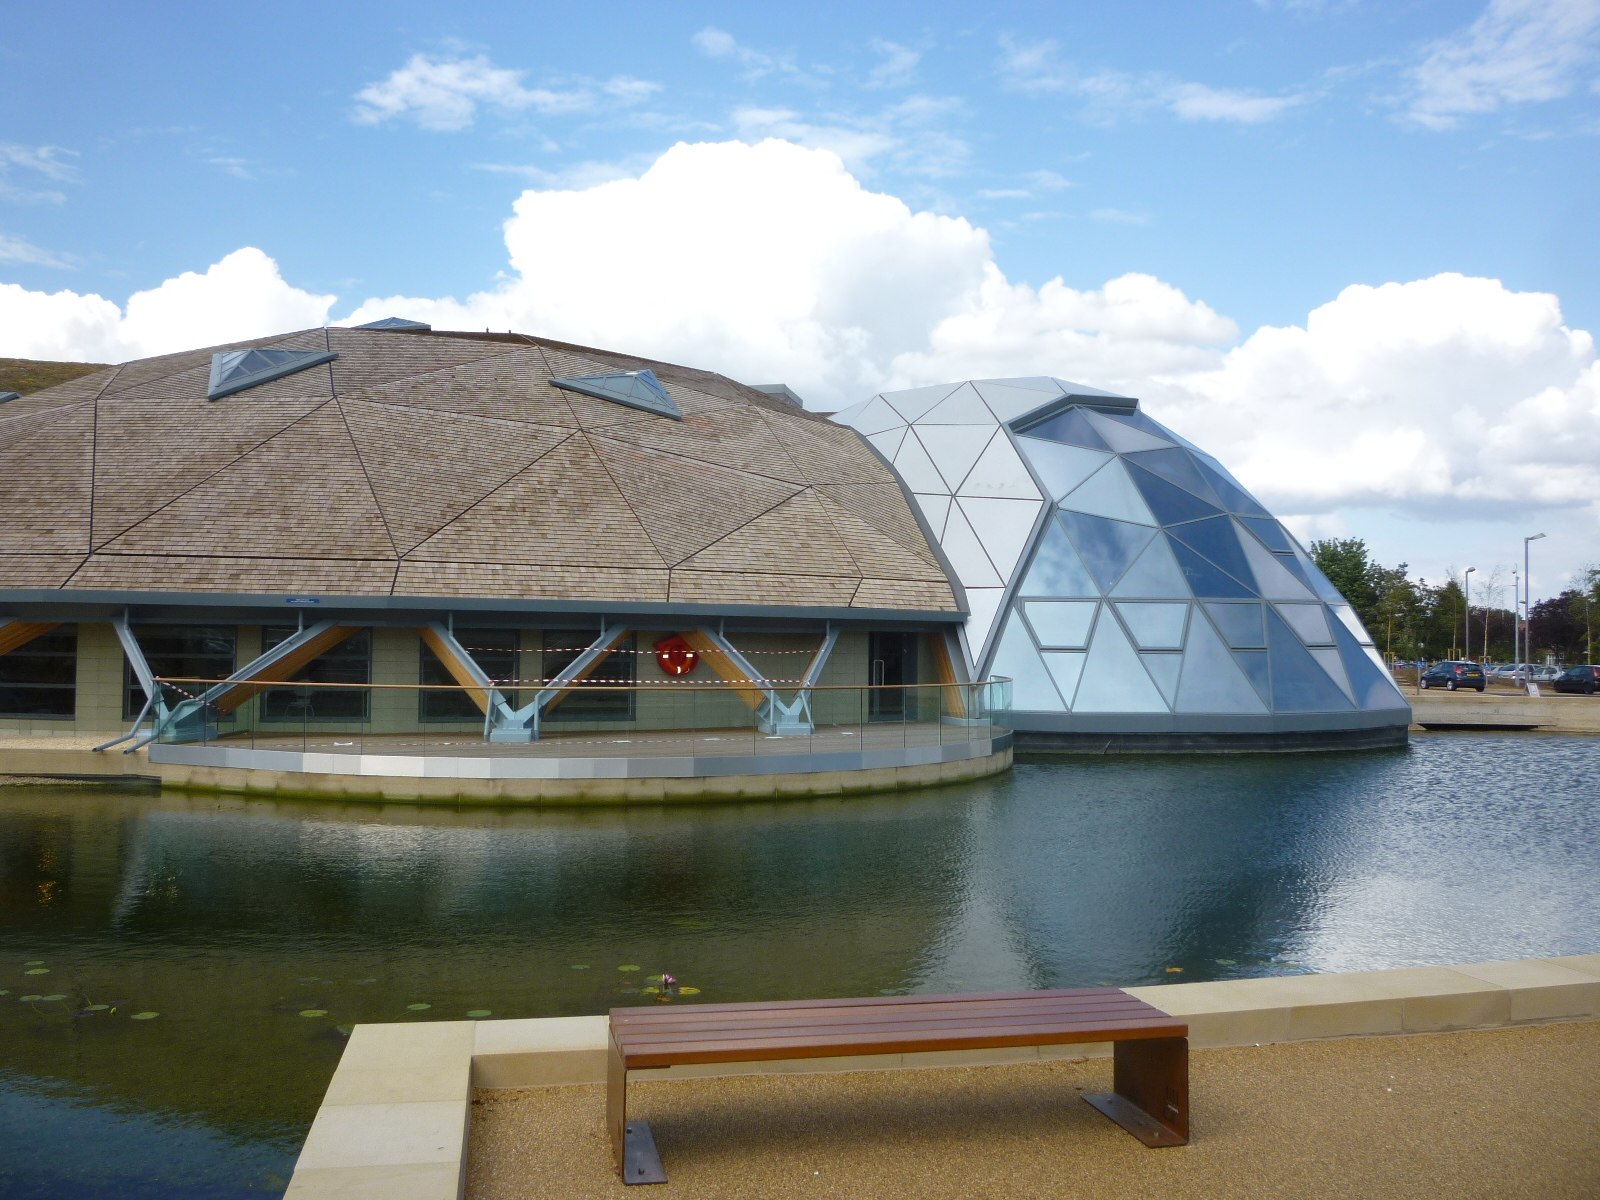 Scunthorpe – The Pods Leisure Centre (2011)